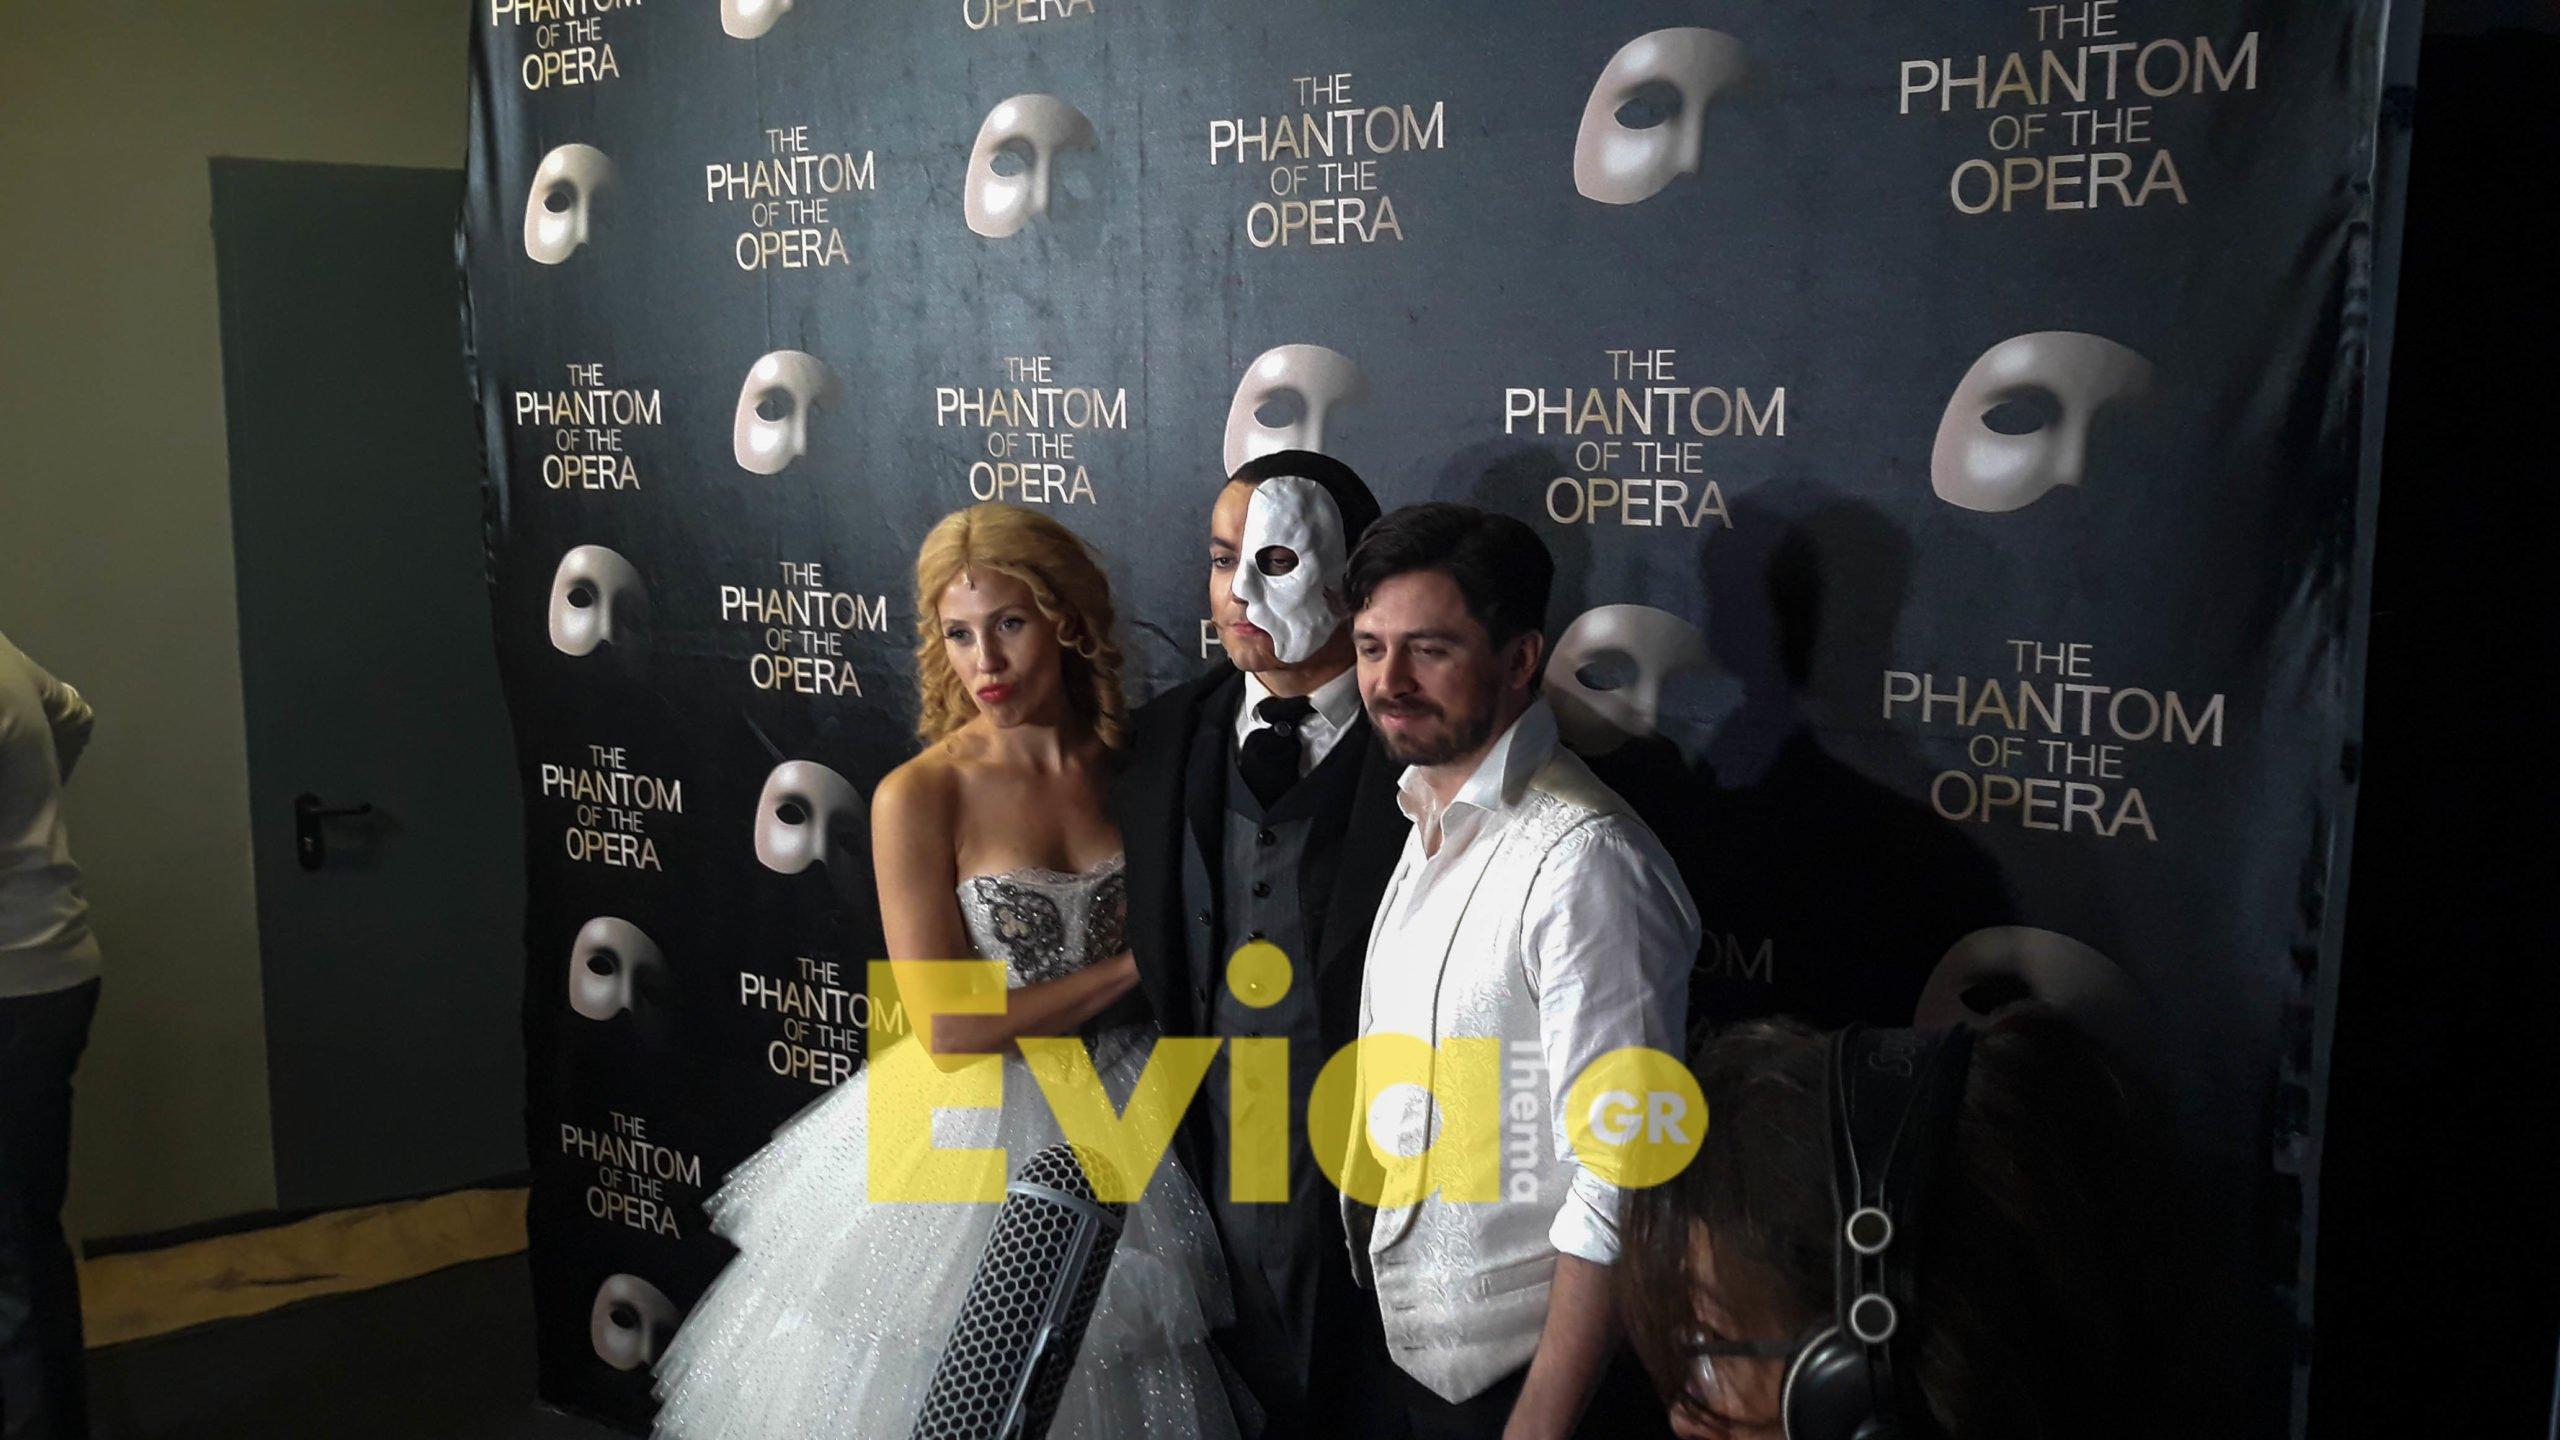 "phantom of the opera ""Phantom of the Opera"" στο Christmas Theater: Ένα εκθαμβωτικό musical (Δηλώσεις-Φωτογραφίες-Βίντεο) 20200223 180525 scaled"